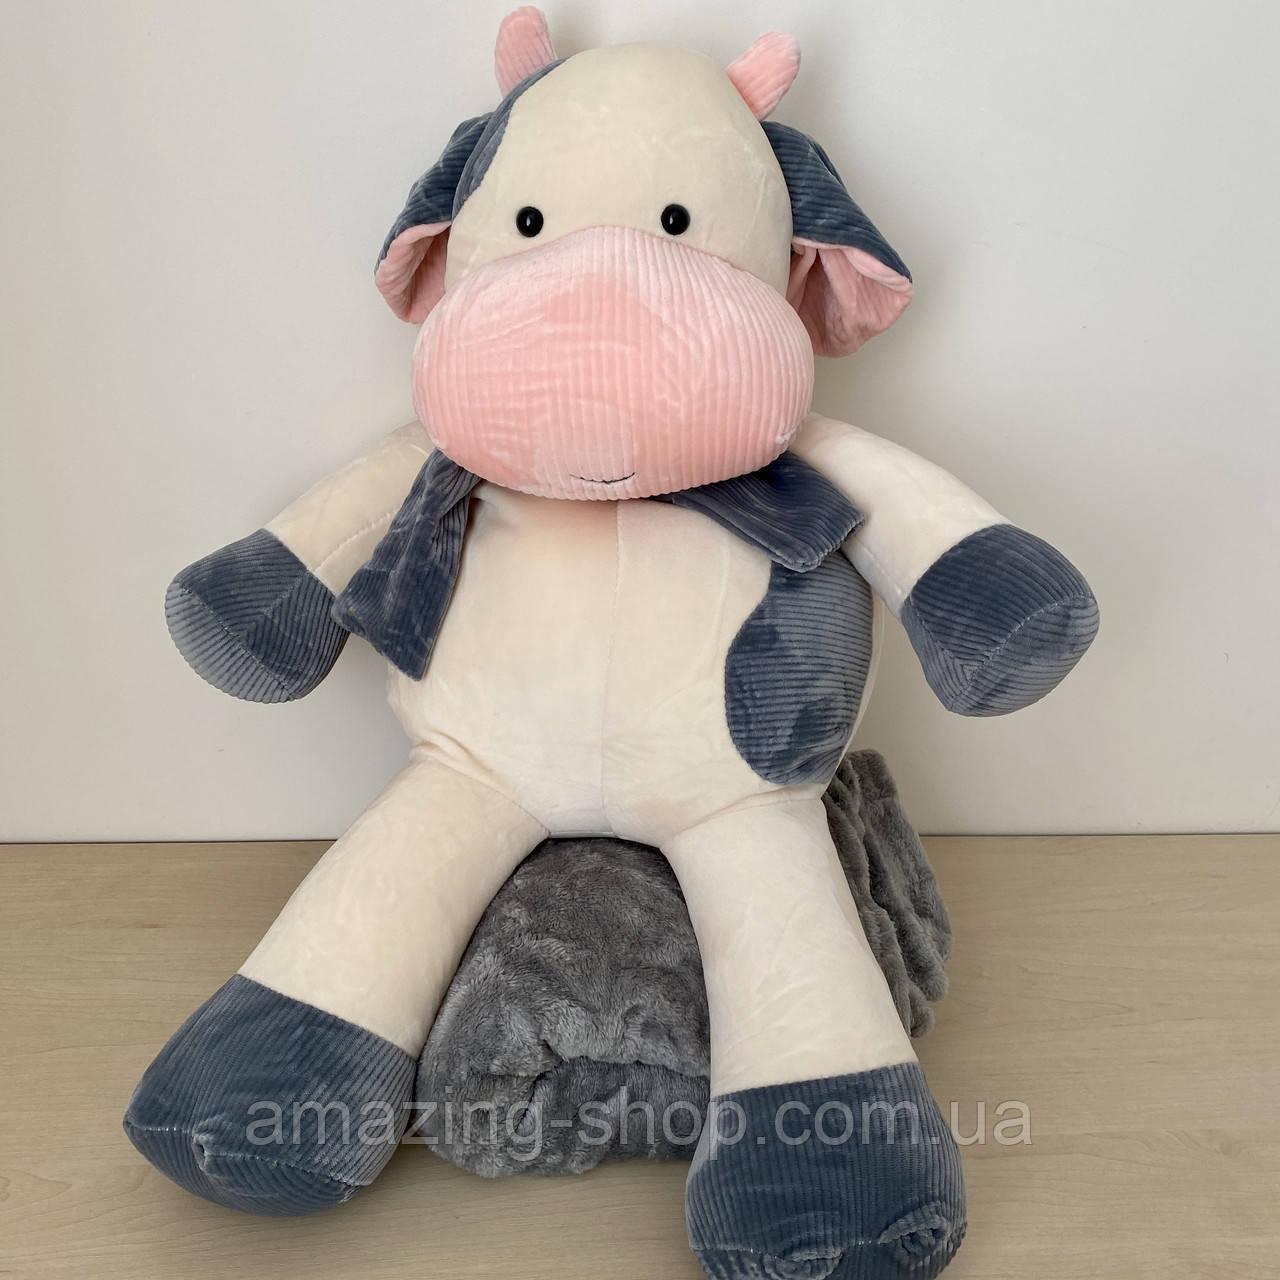 Плед подушка игрушка 3в1. Дитяча іграшка - плед бычок. Размер игрушки 45 см. Плед размер 120*160см.